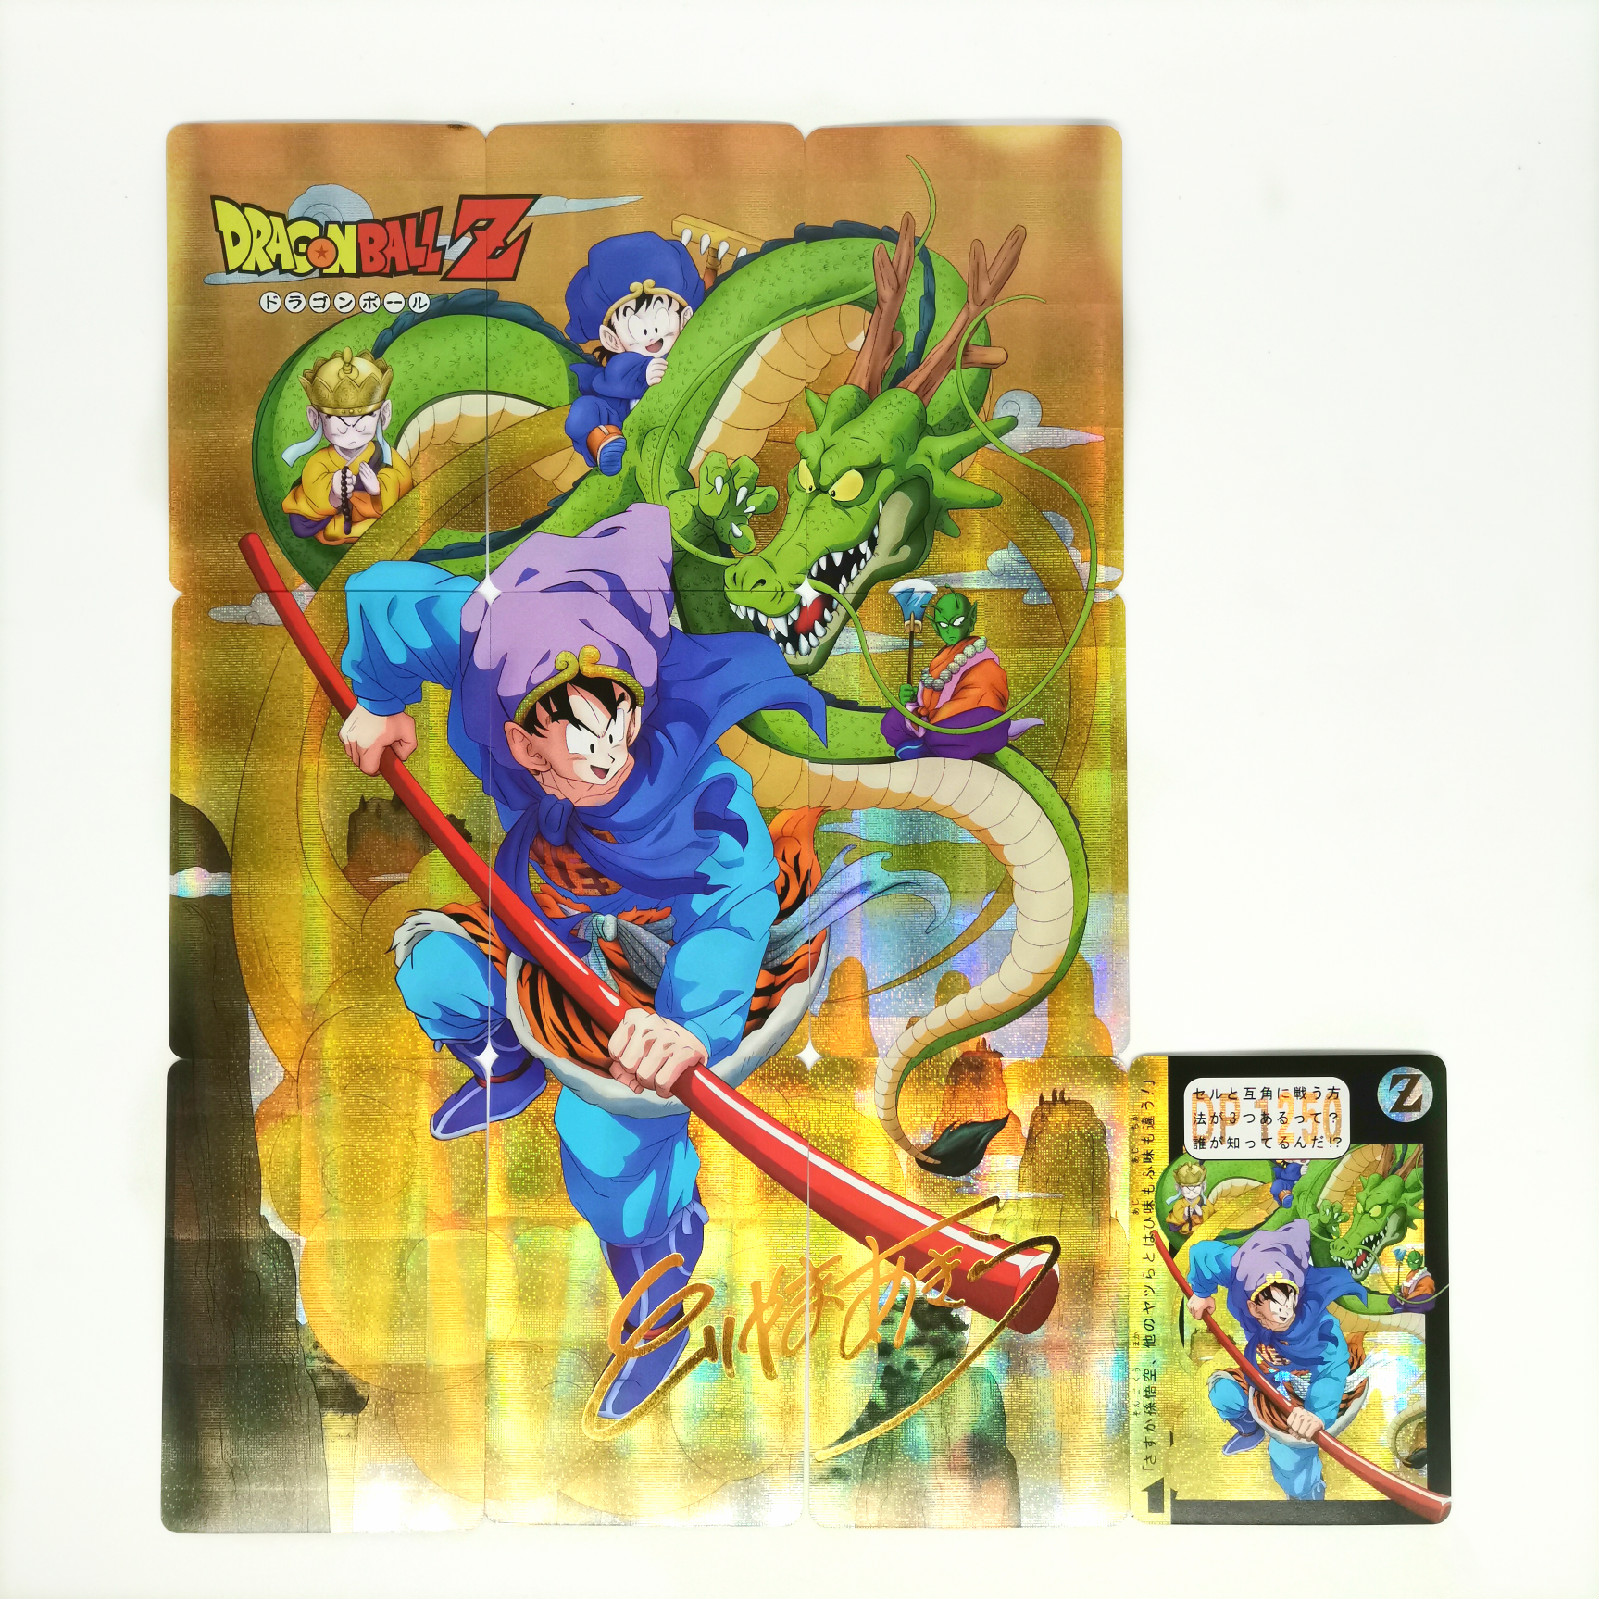 10pcs Super Dragon Ball Z Bronzing 9in1 Heroes Battle Card Ultra Instinct Son Gohan Vegeta Game Collection Cards